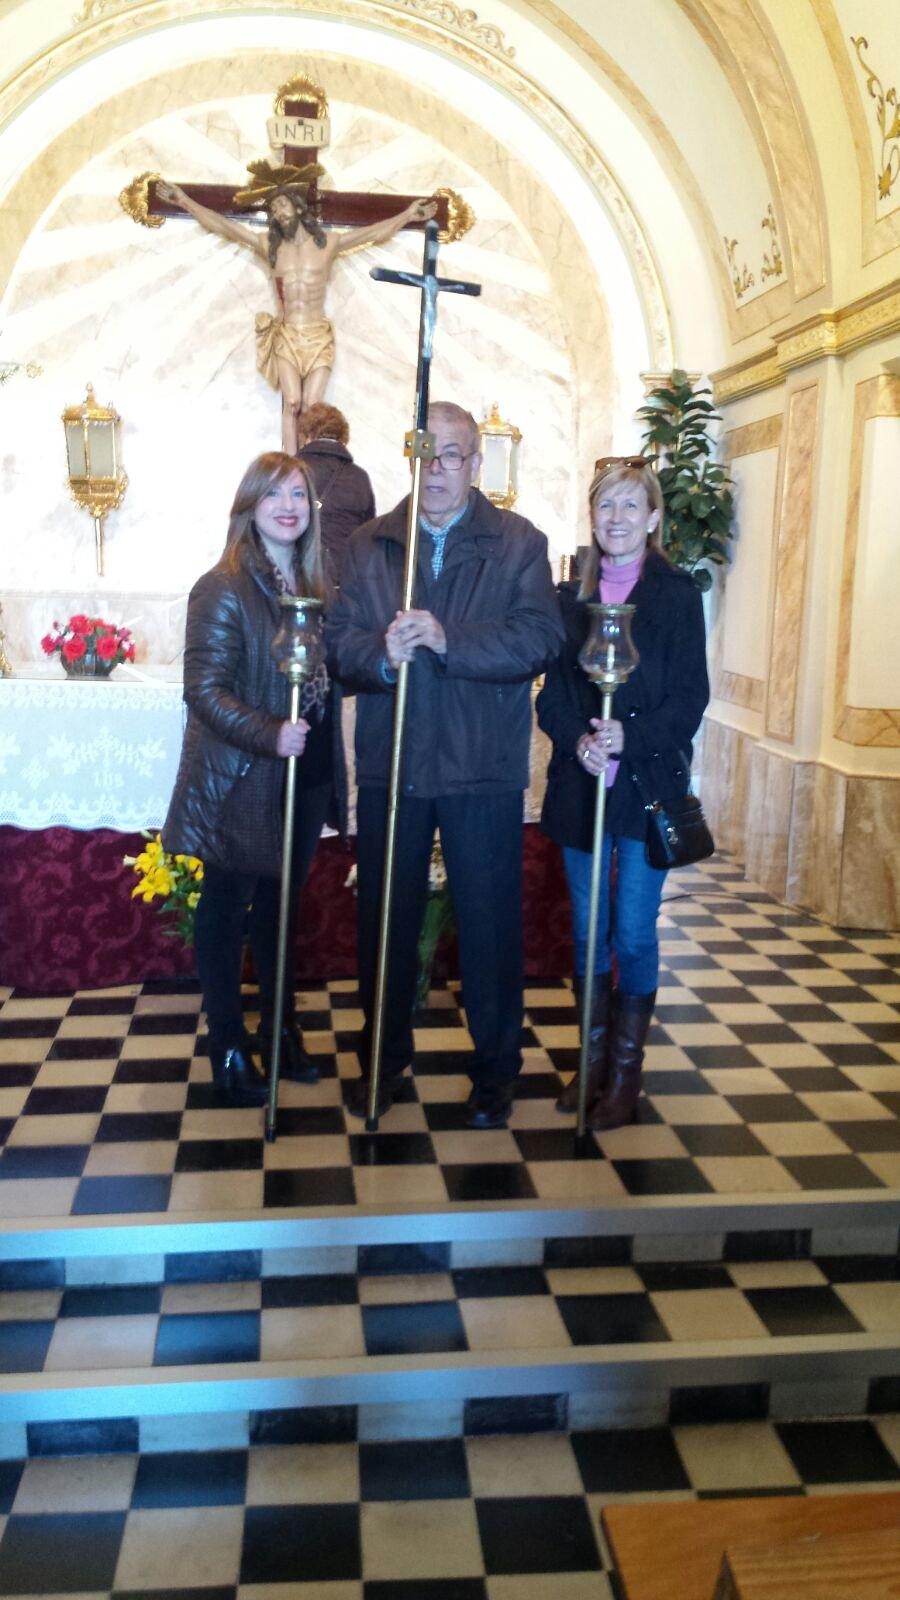 (2016-03-18) - Vía Crucis parroquial - María Isabel Berenguer Brotons  (1)